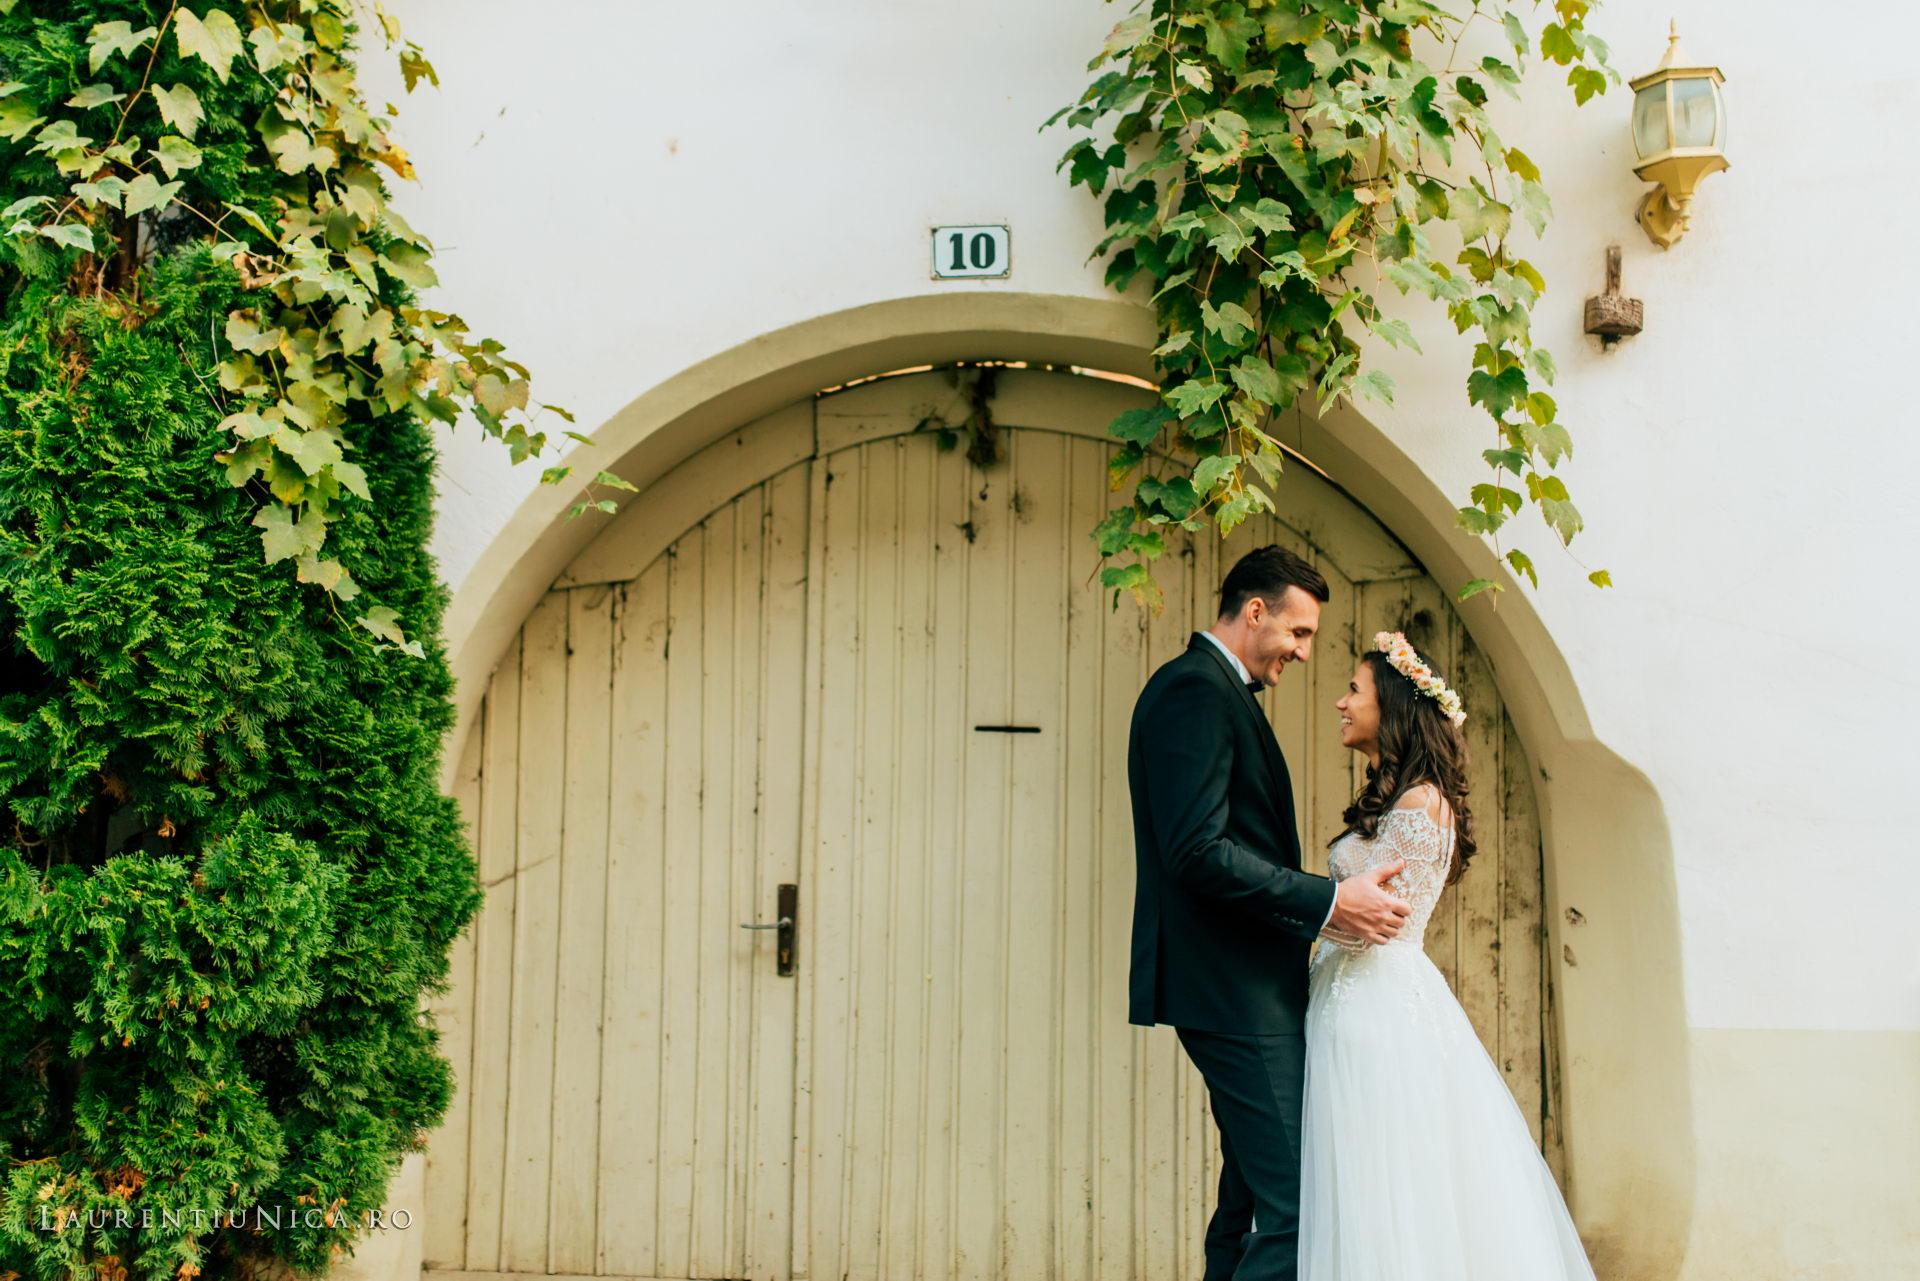 lili-si-dan-fotografii-nunta-after-wedding-sighisoara-laurentiu-nica41